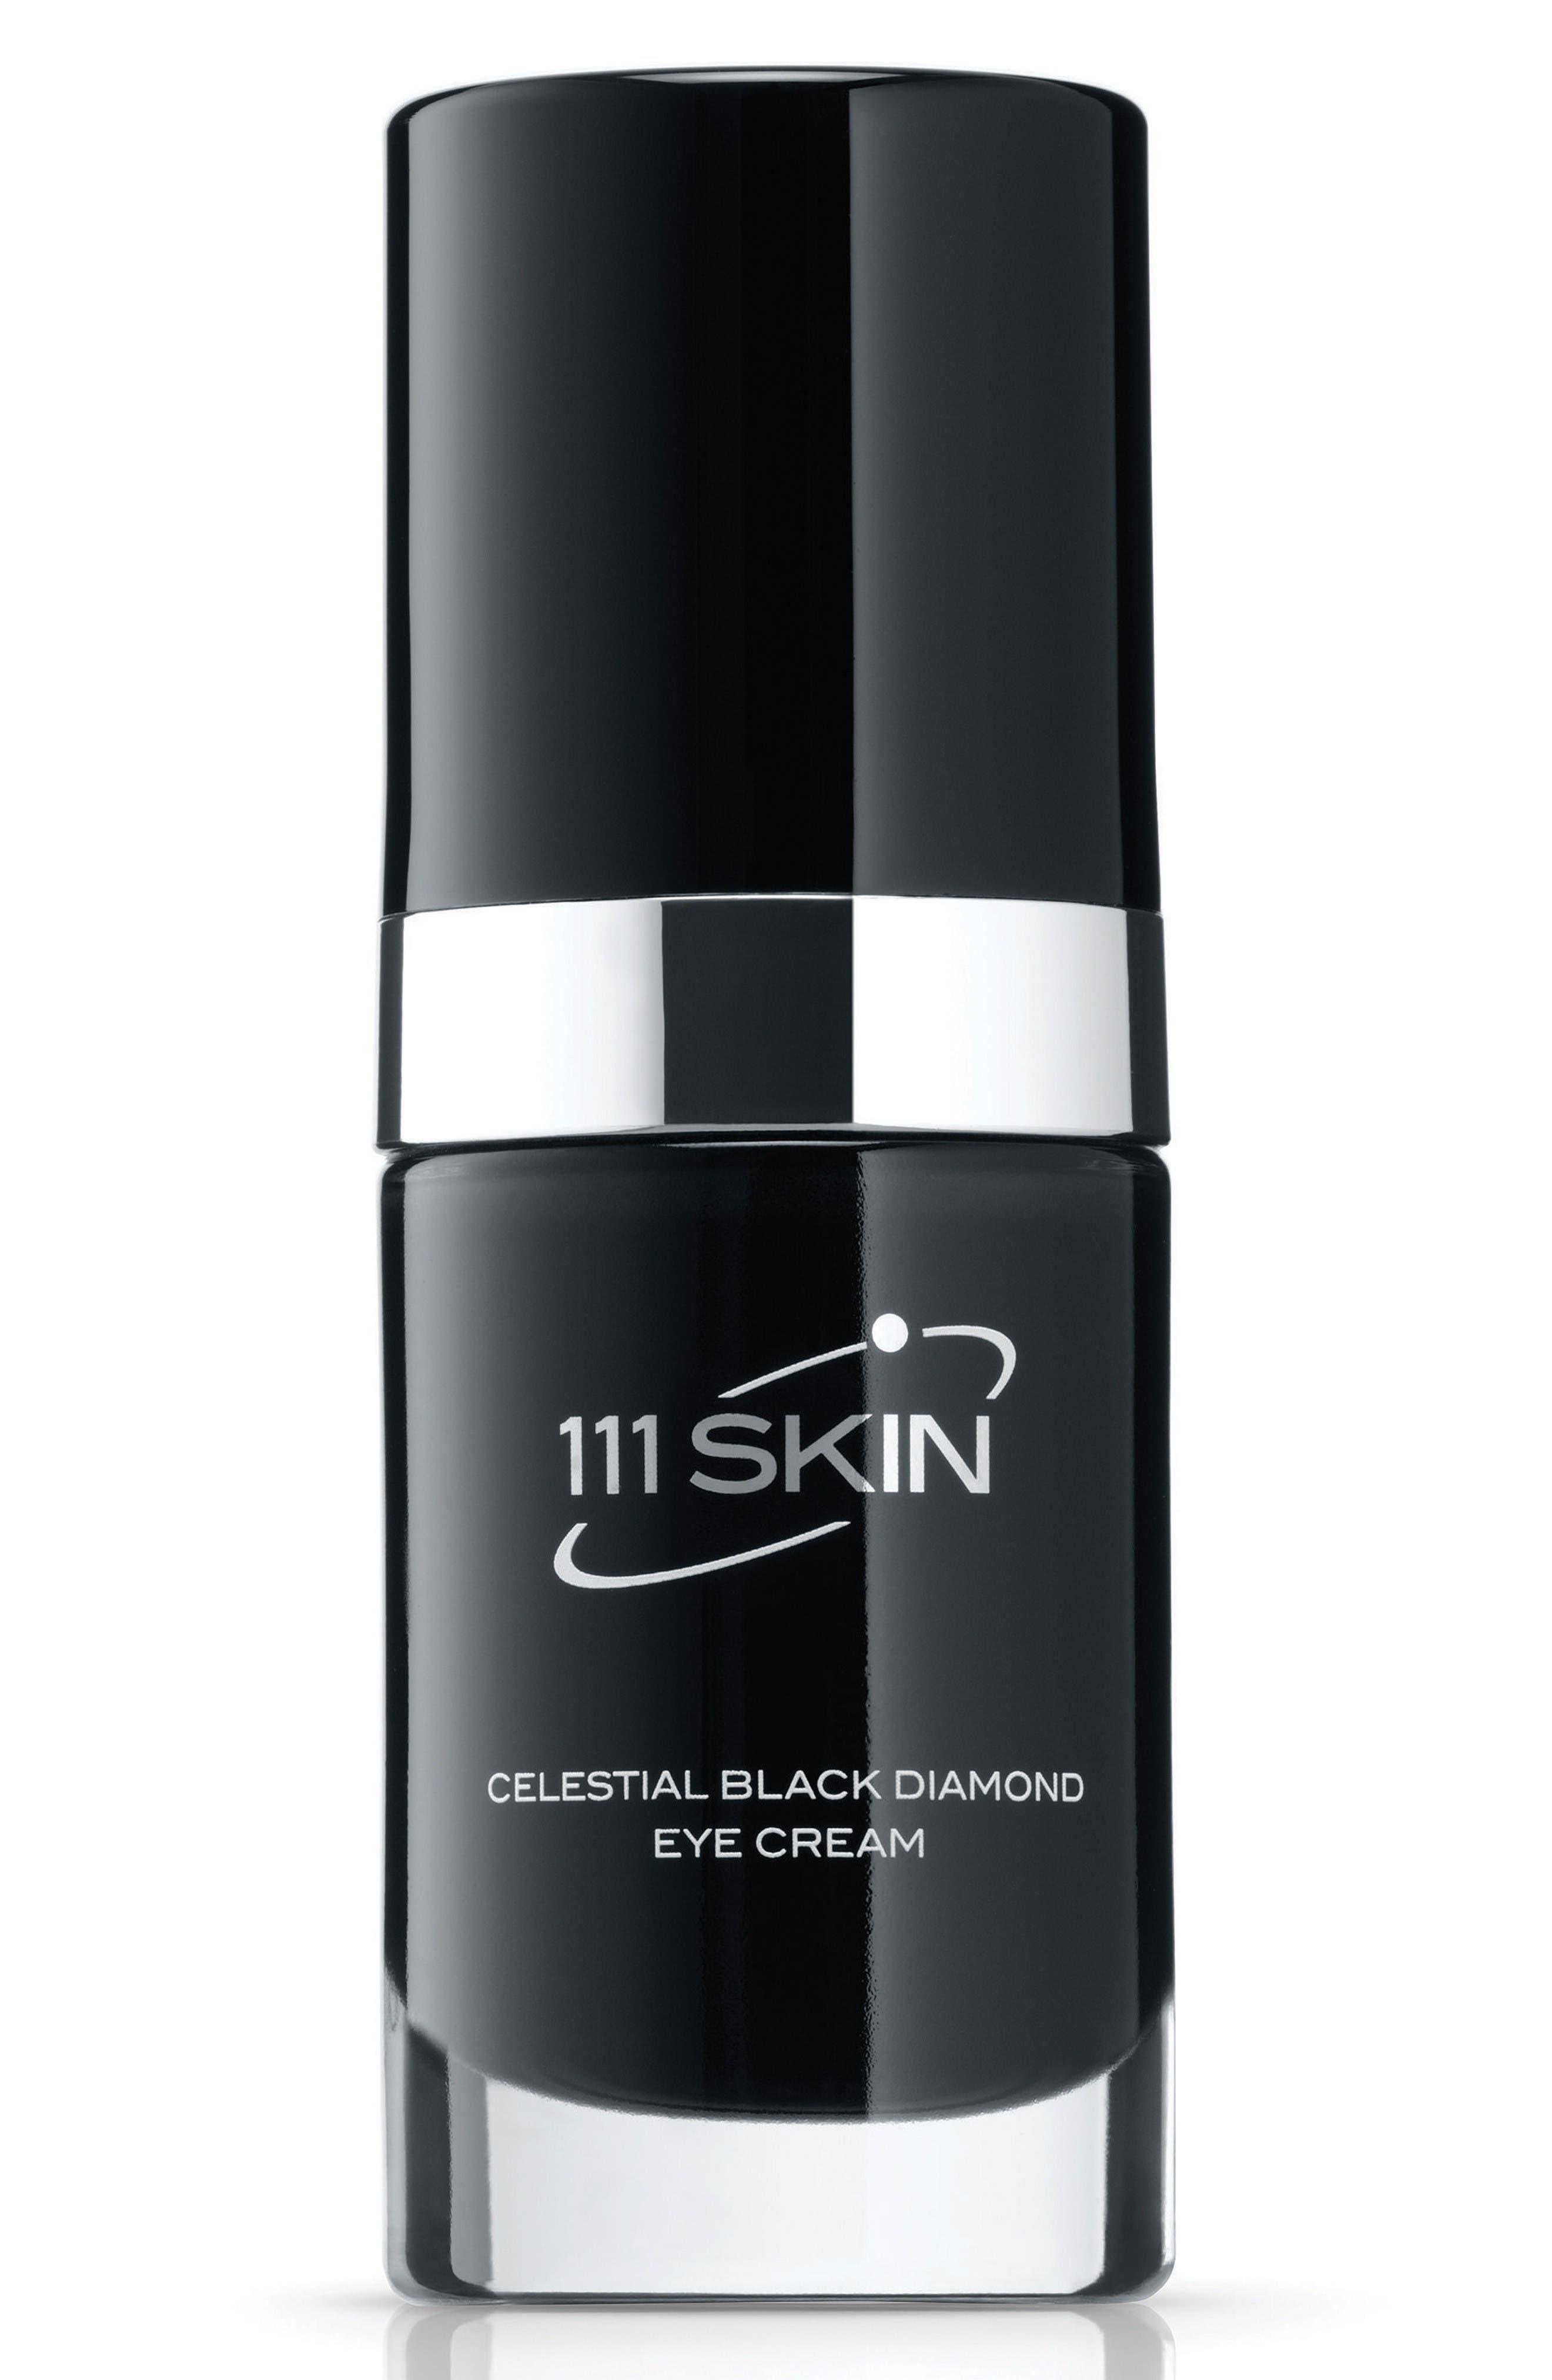 Main Image - SPACE.NK.apothecary 111SKIN Celestial Black Diamond Eye Cream